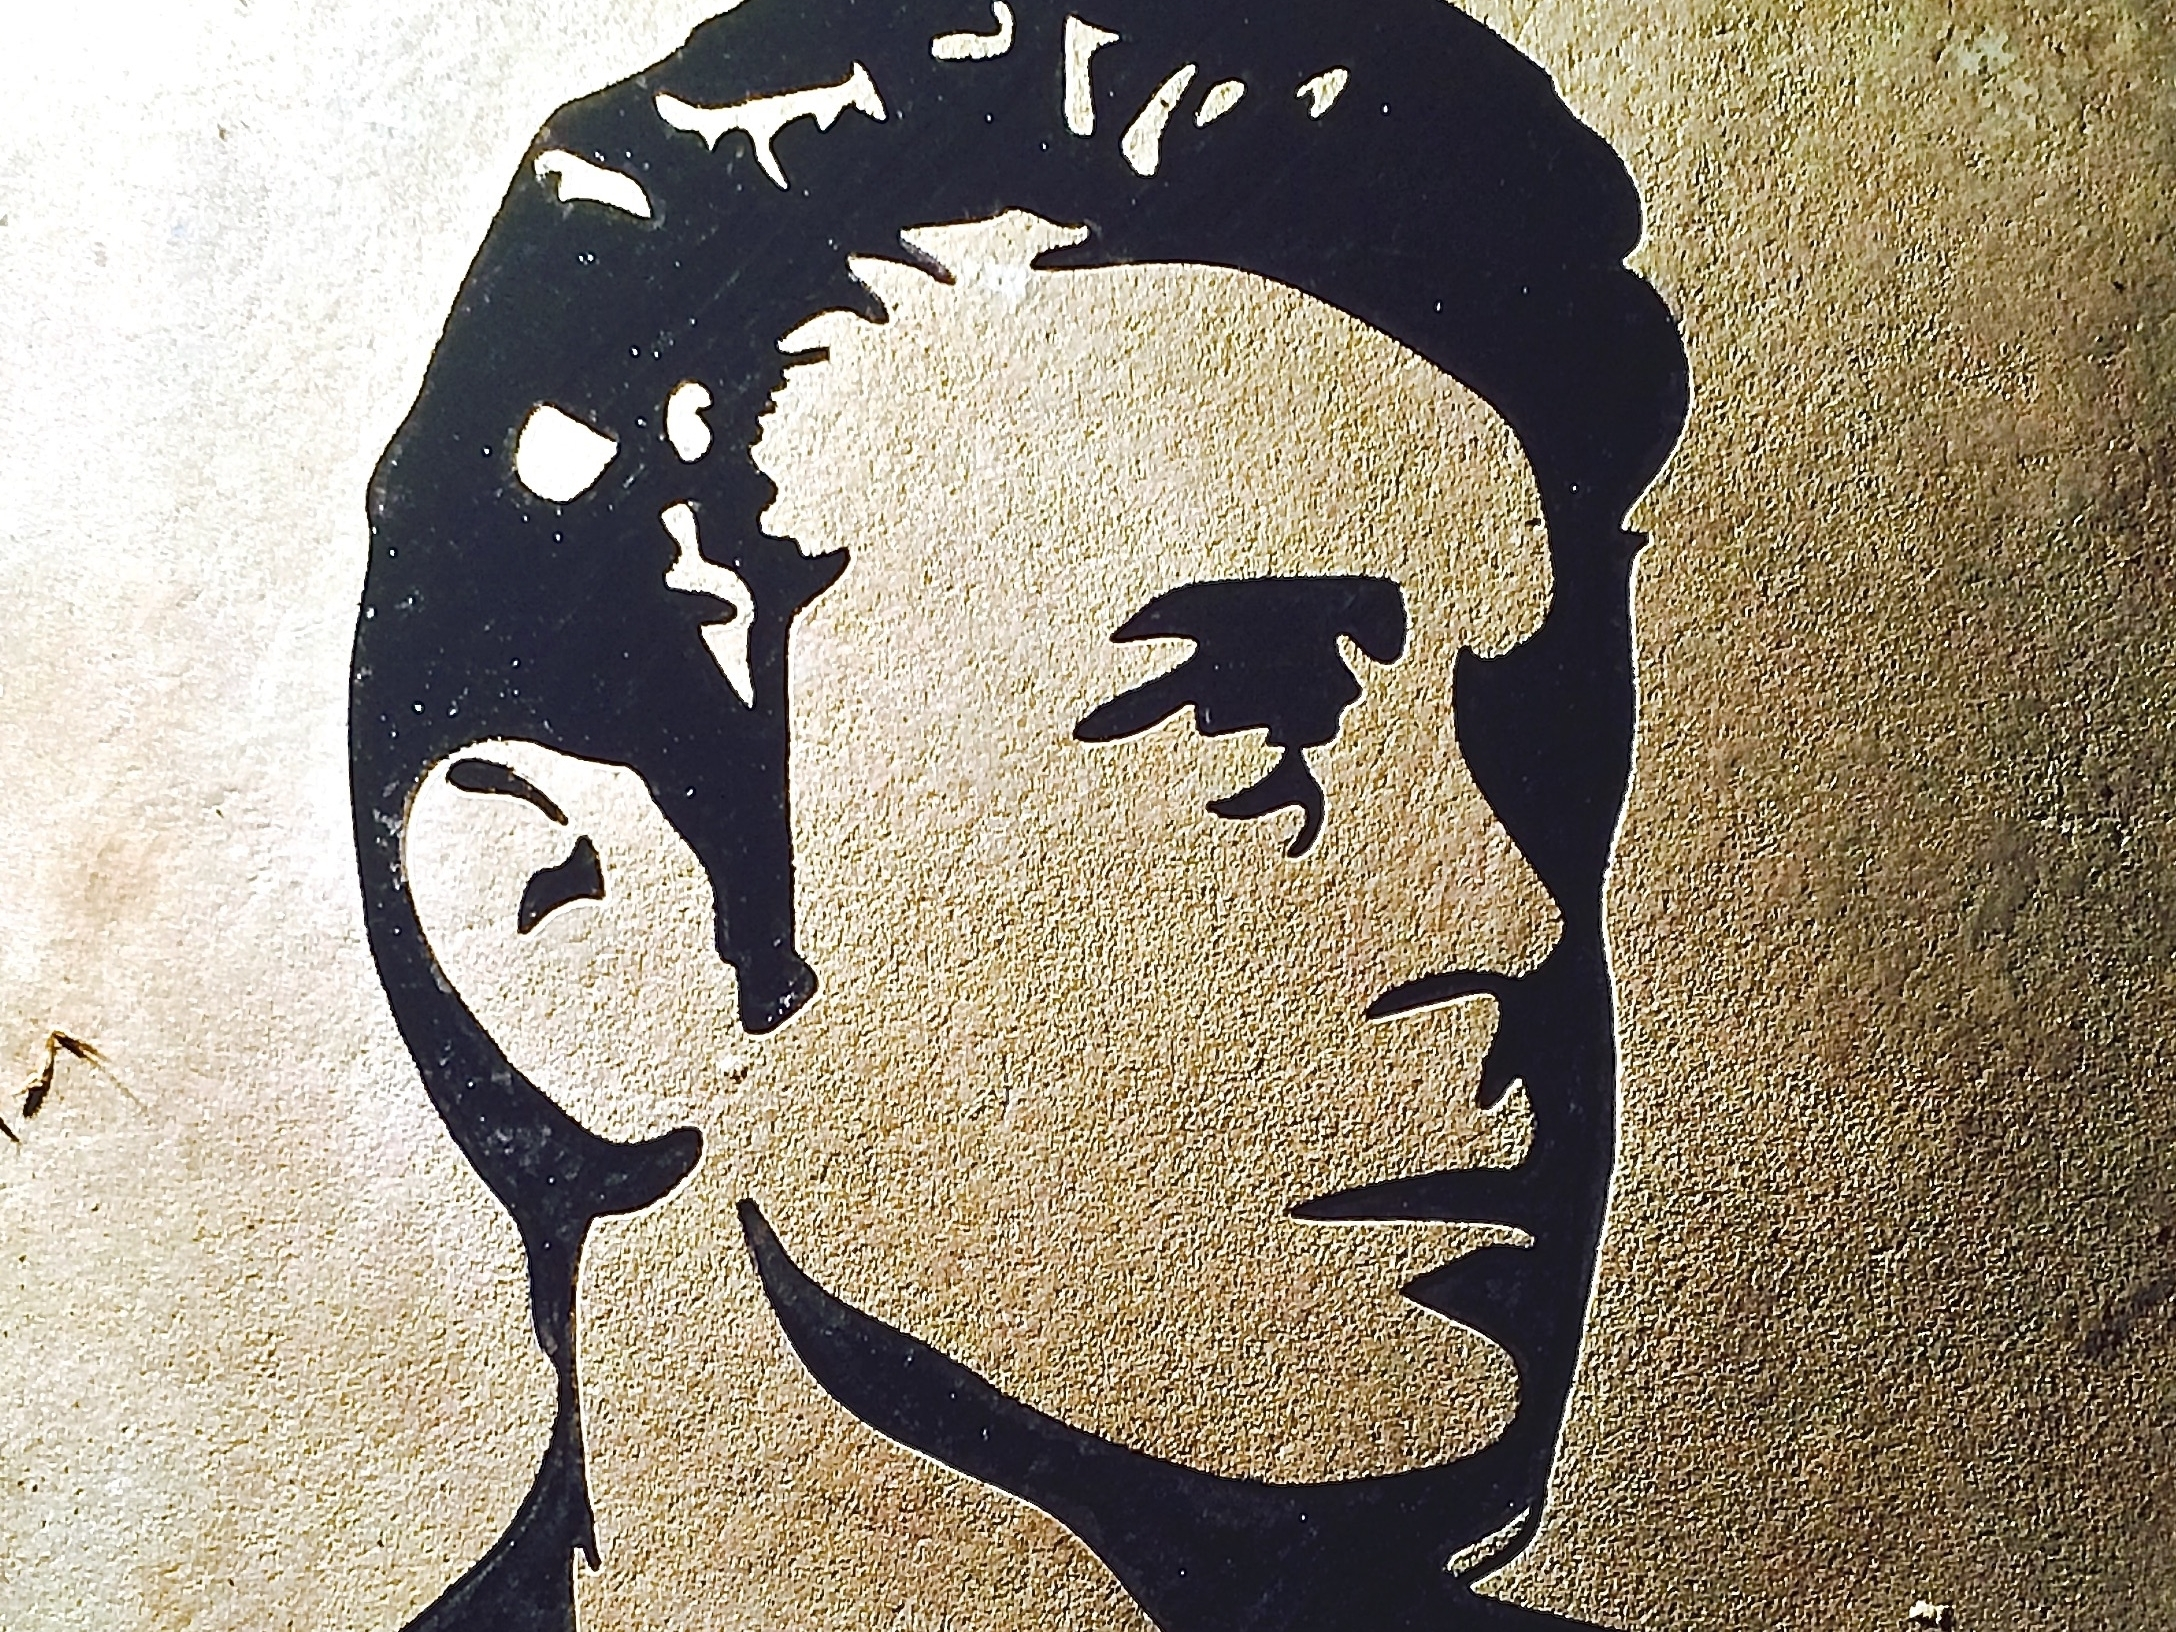 James Dean Image Engraving